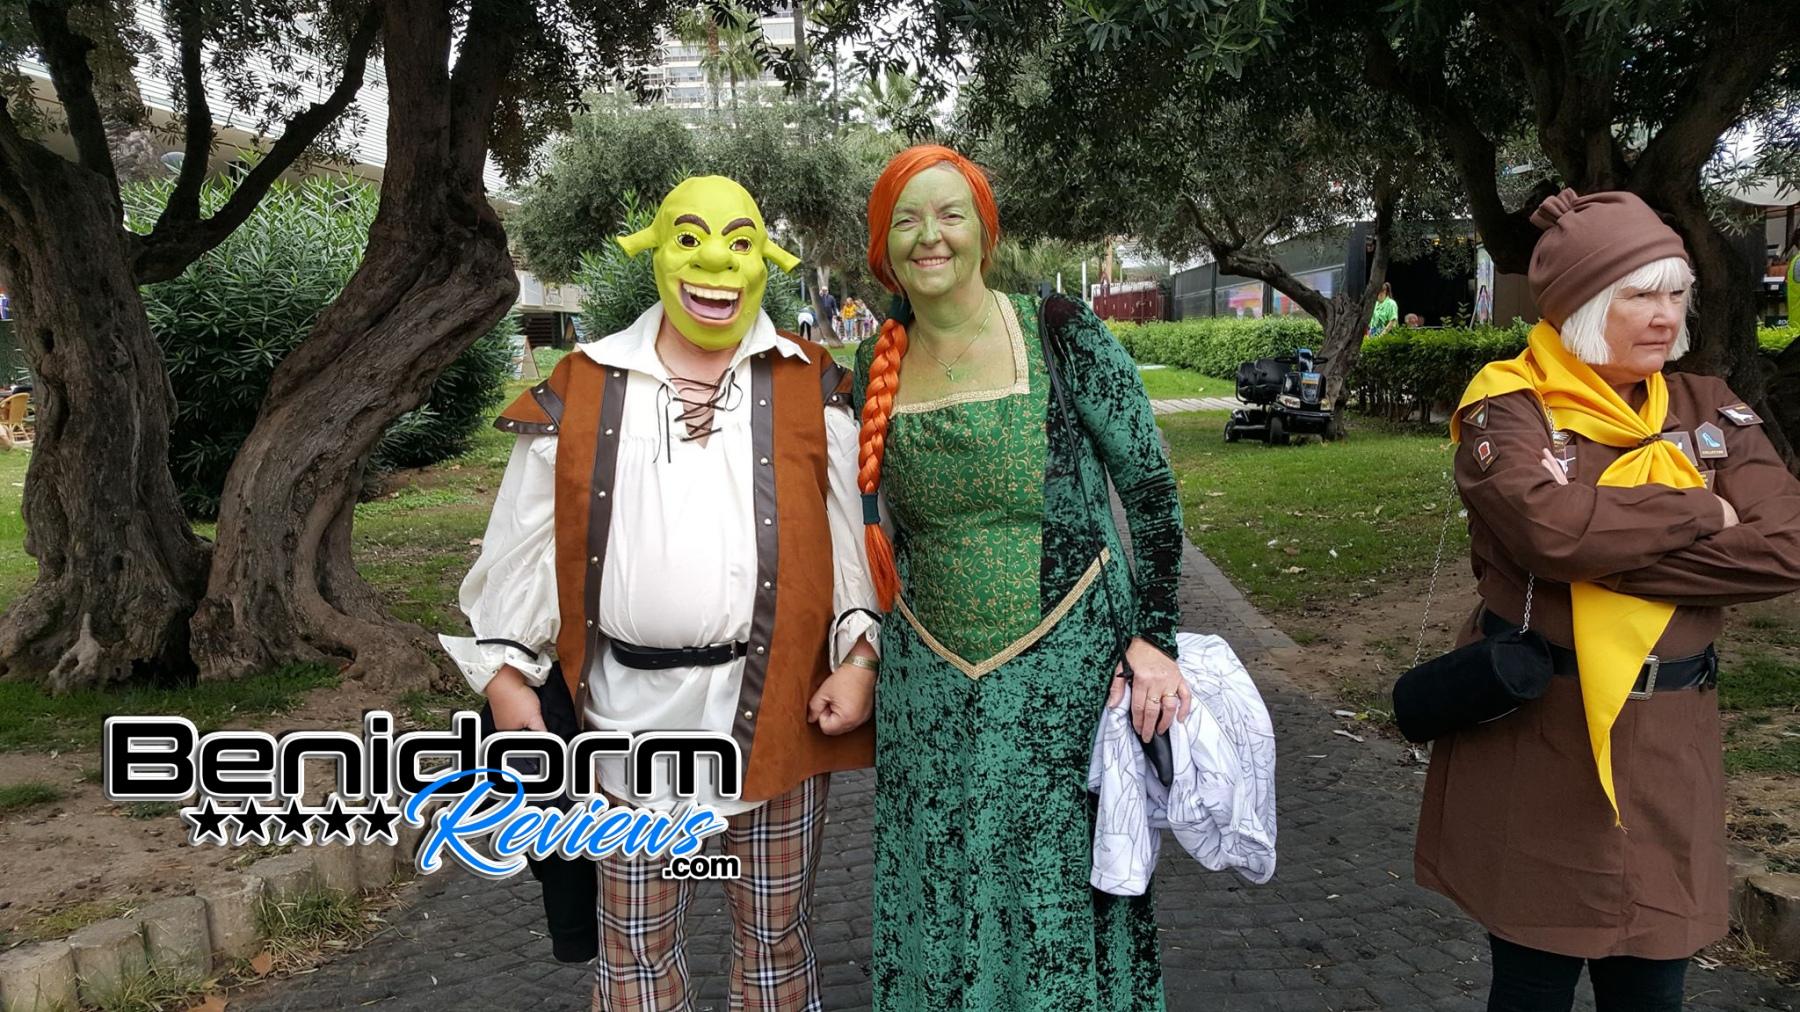 Benidorm-Fiestas-2019-Fancy-Dress-78